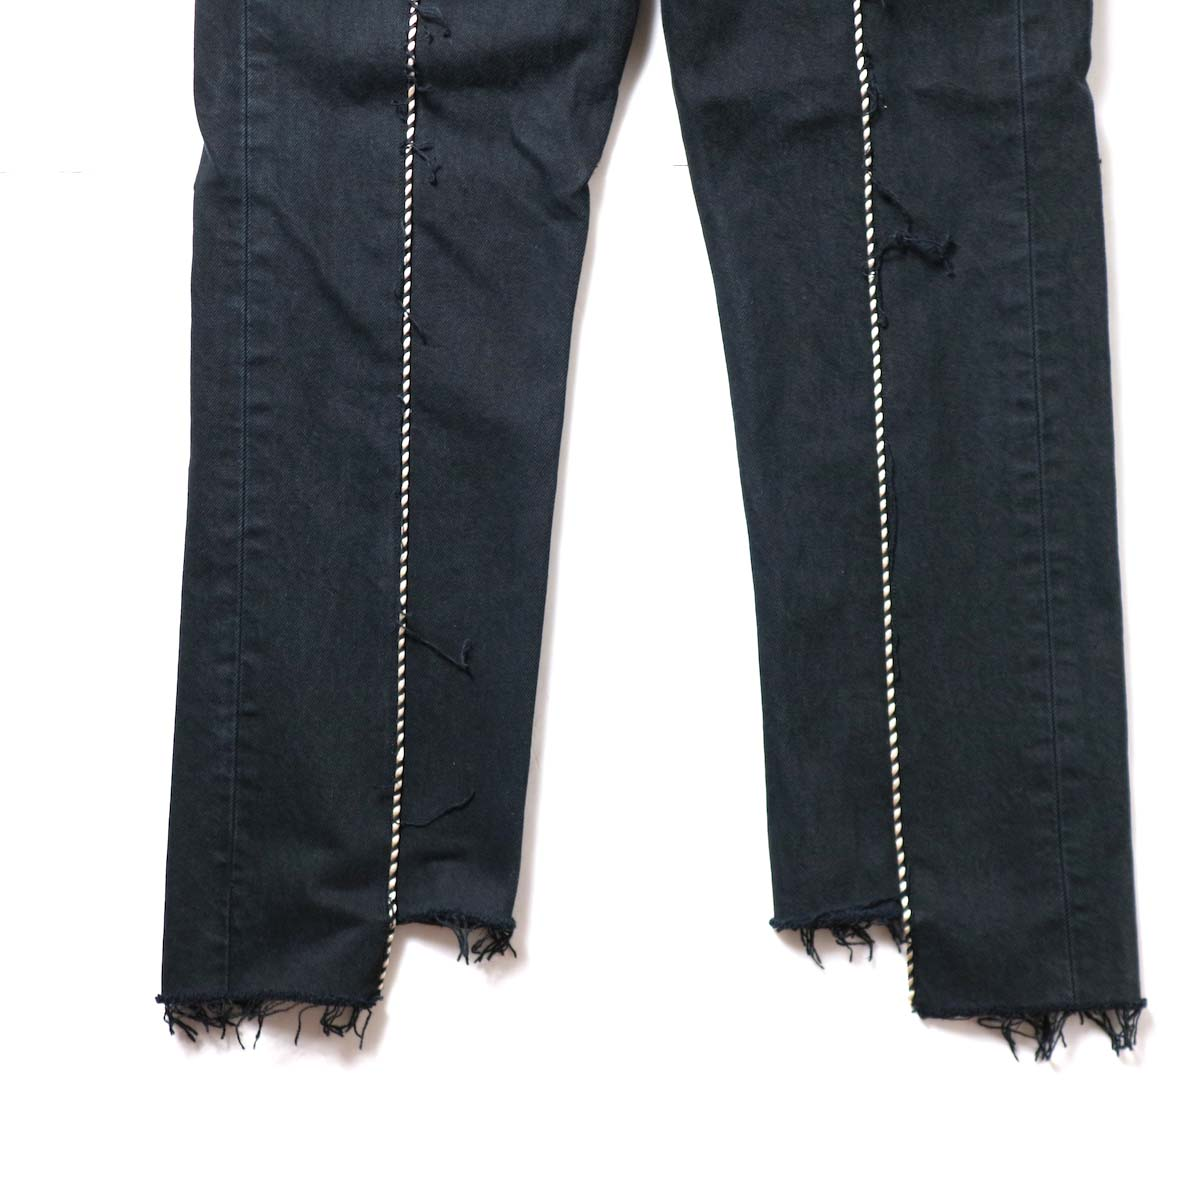 OLD PARK / Western Jeans Black (Msize-F)裾